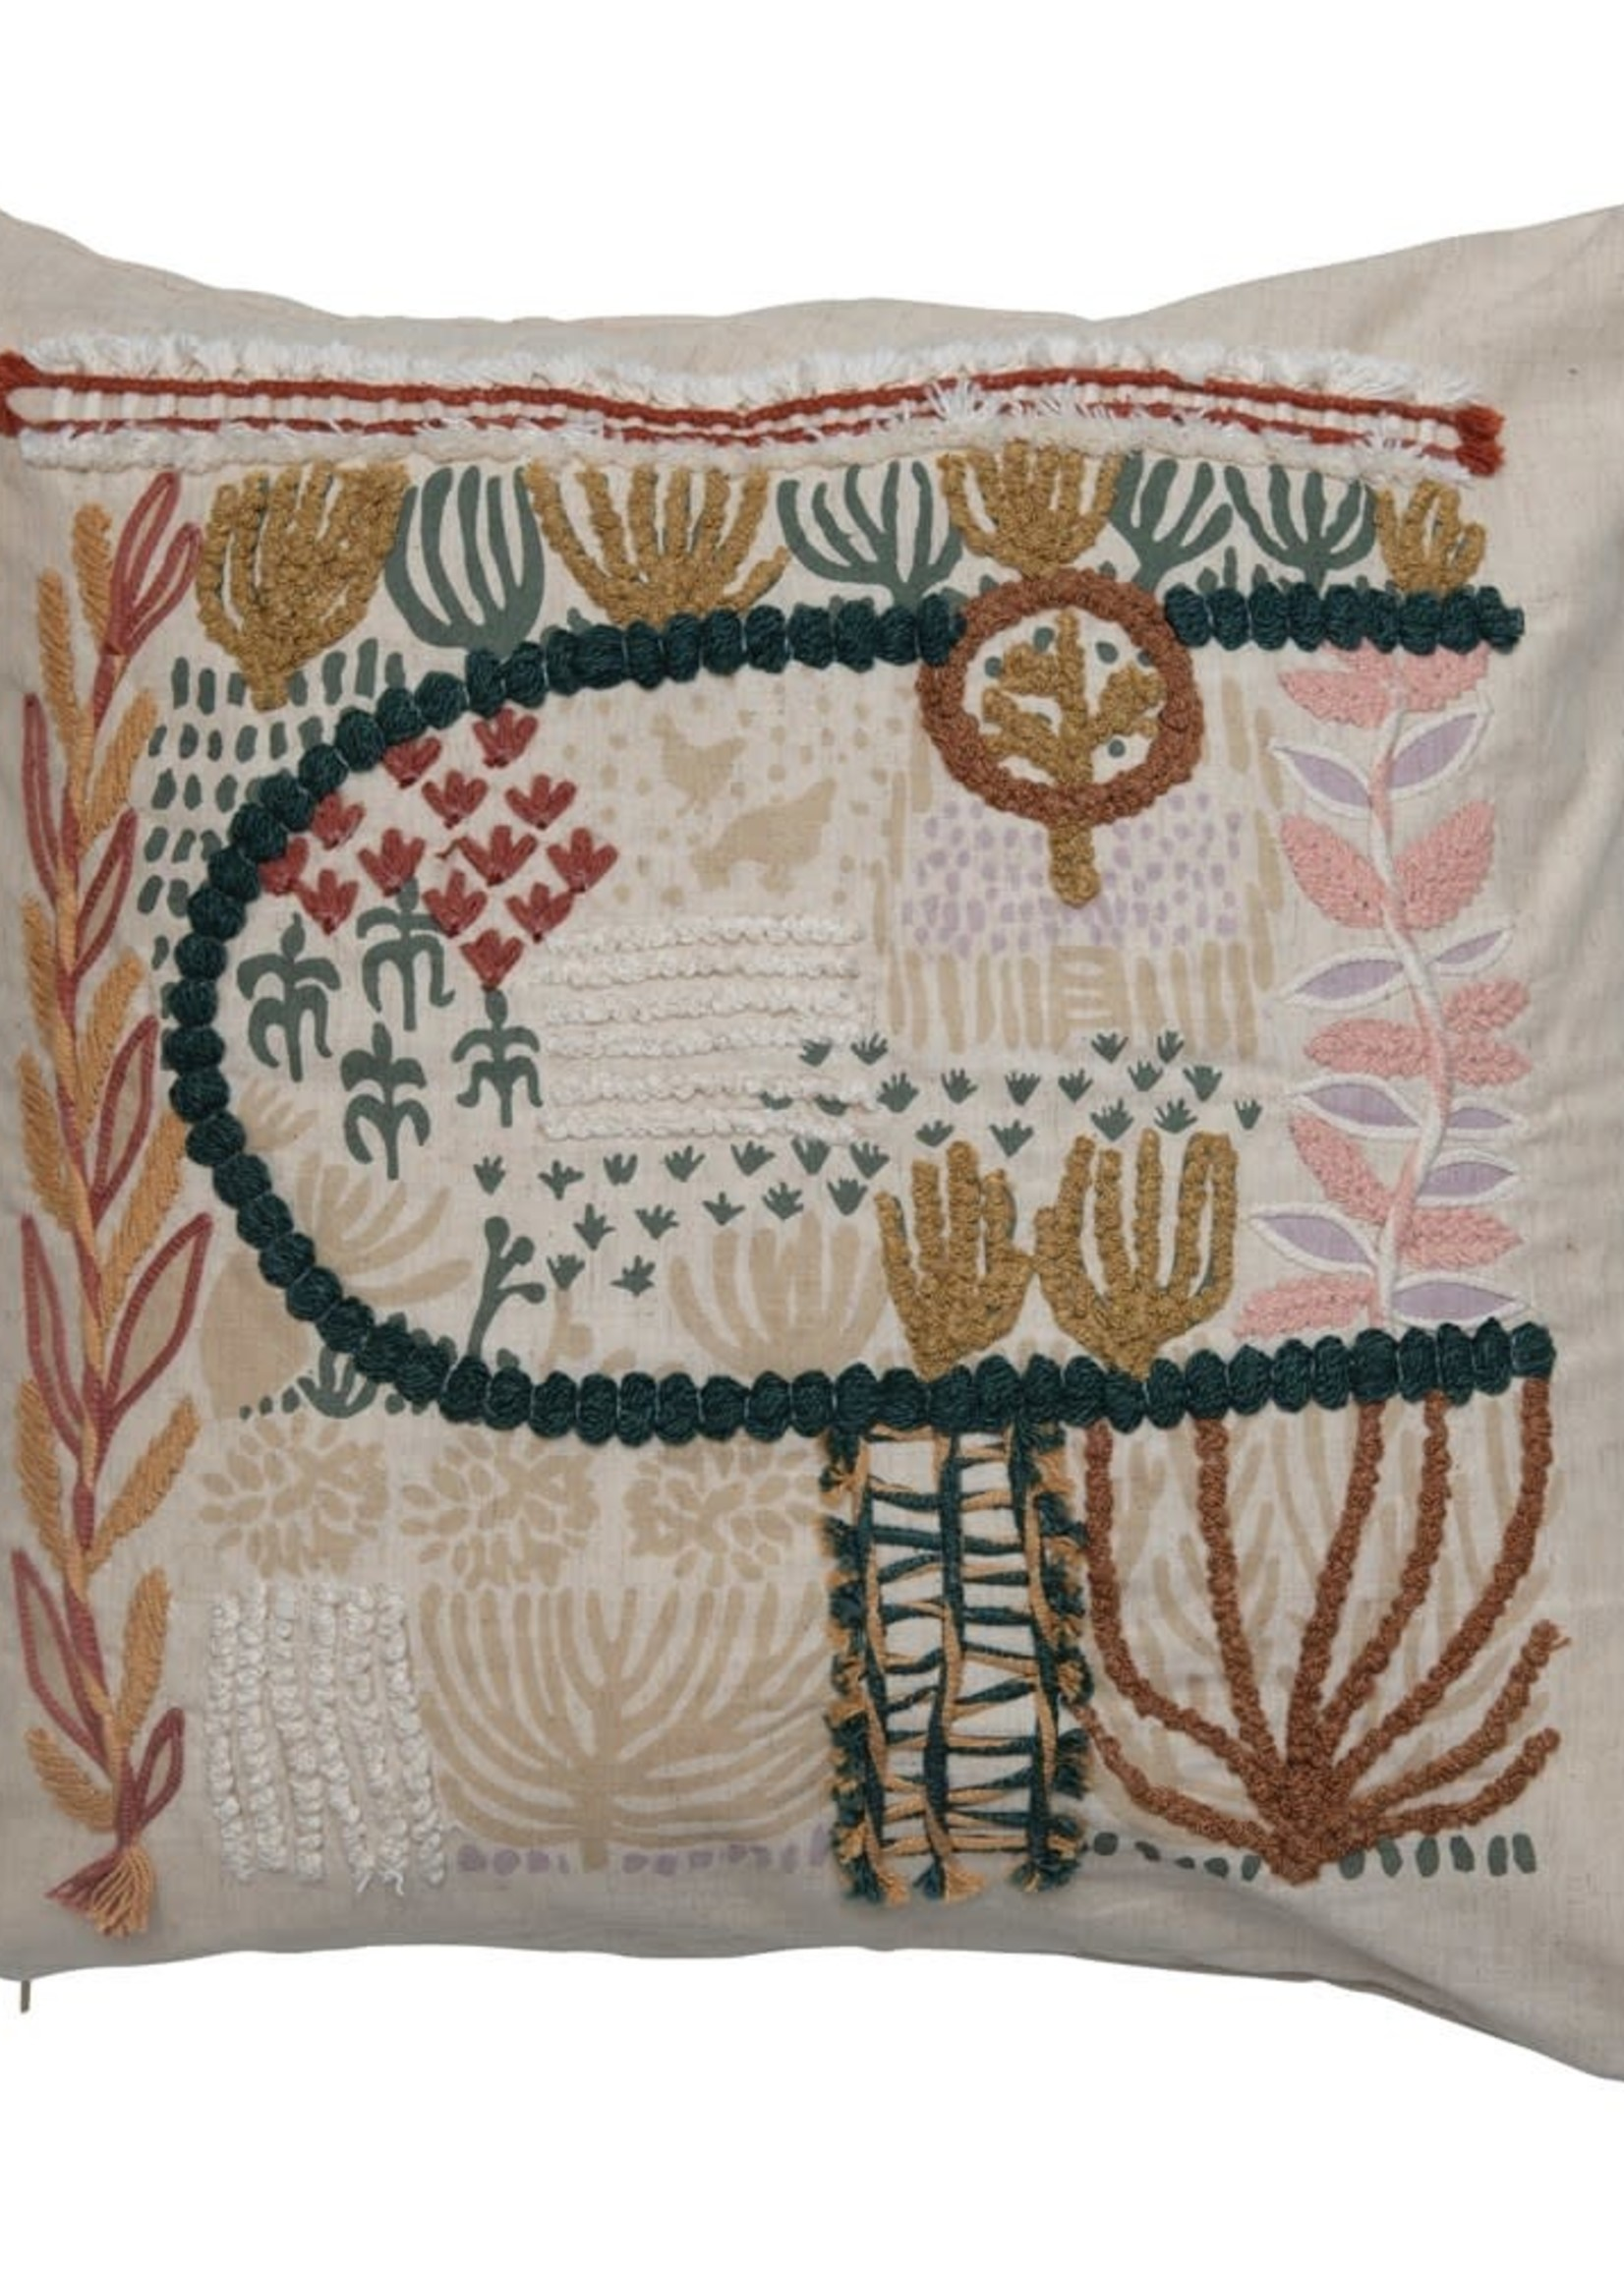 Square Cotton Blend Pillow w/ Embroidery, Multi Color